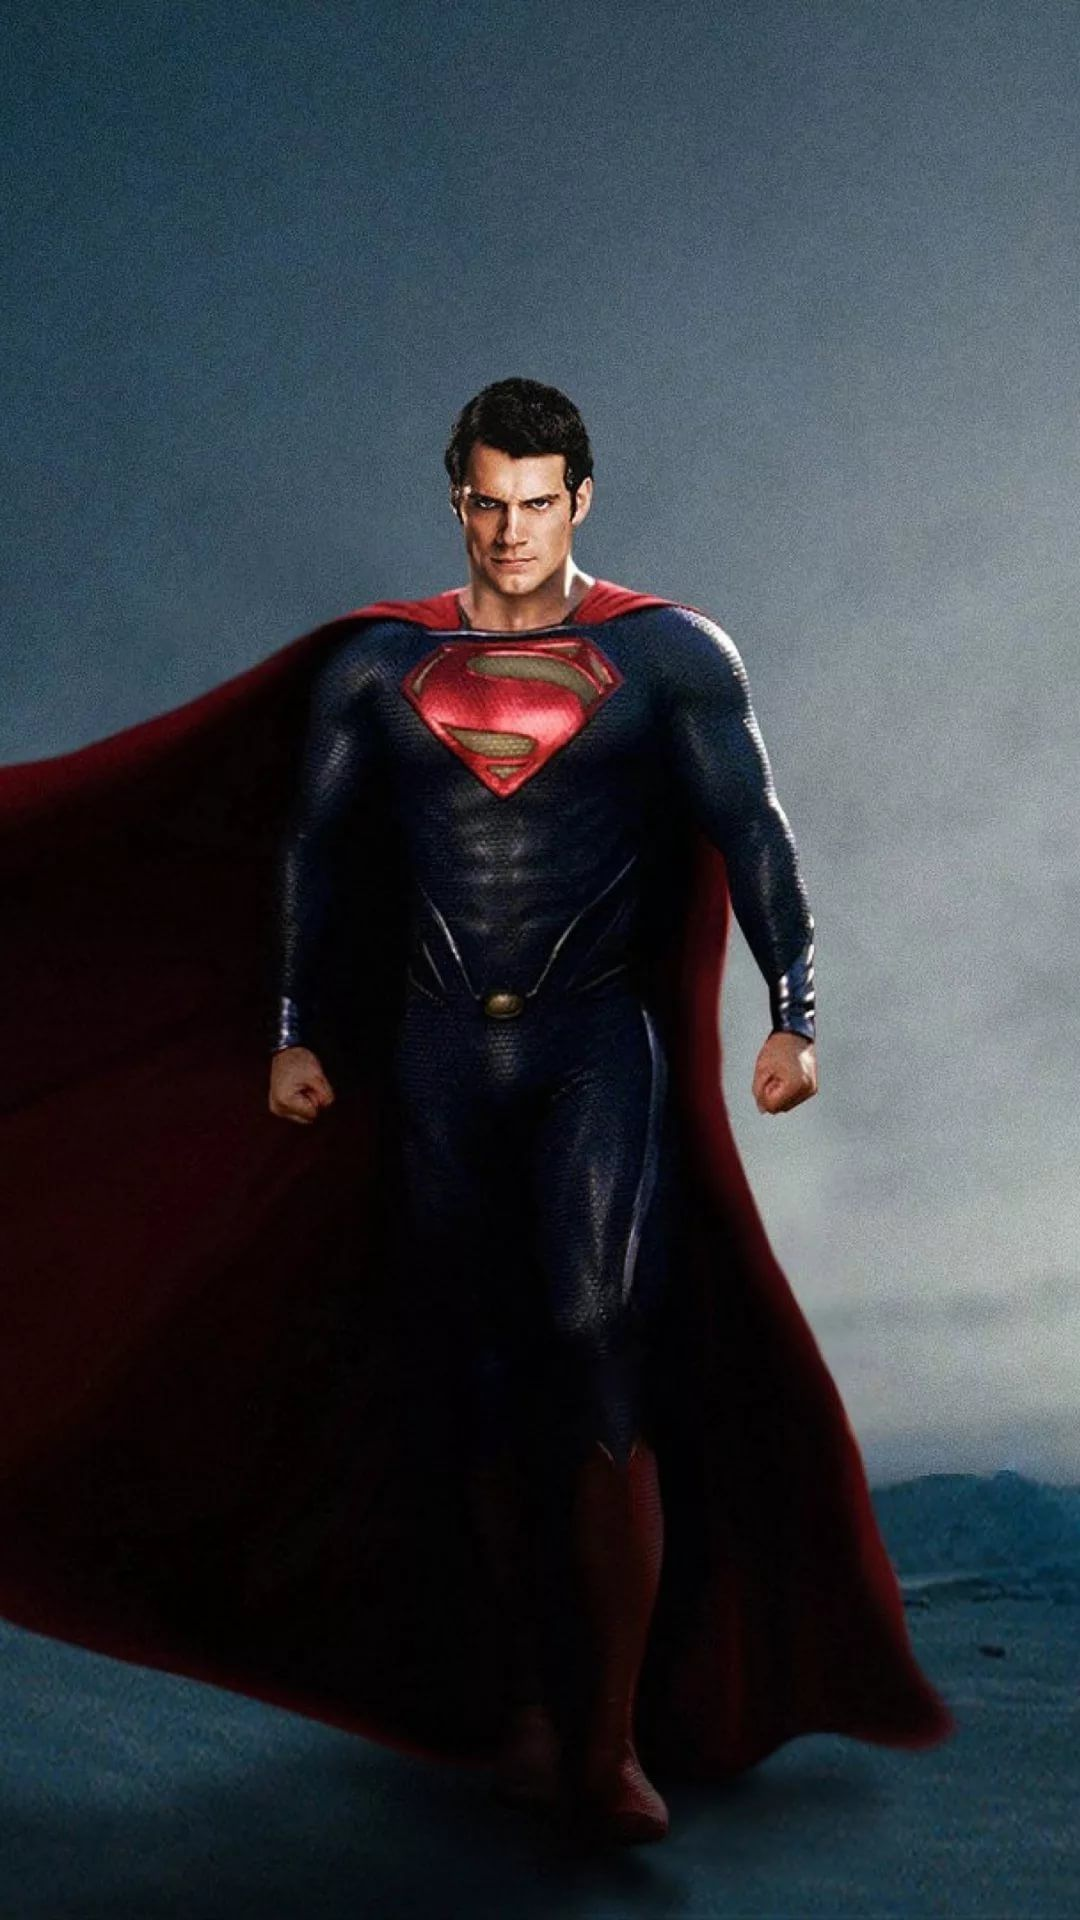 Superman iPhone wallpaper size